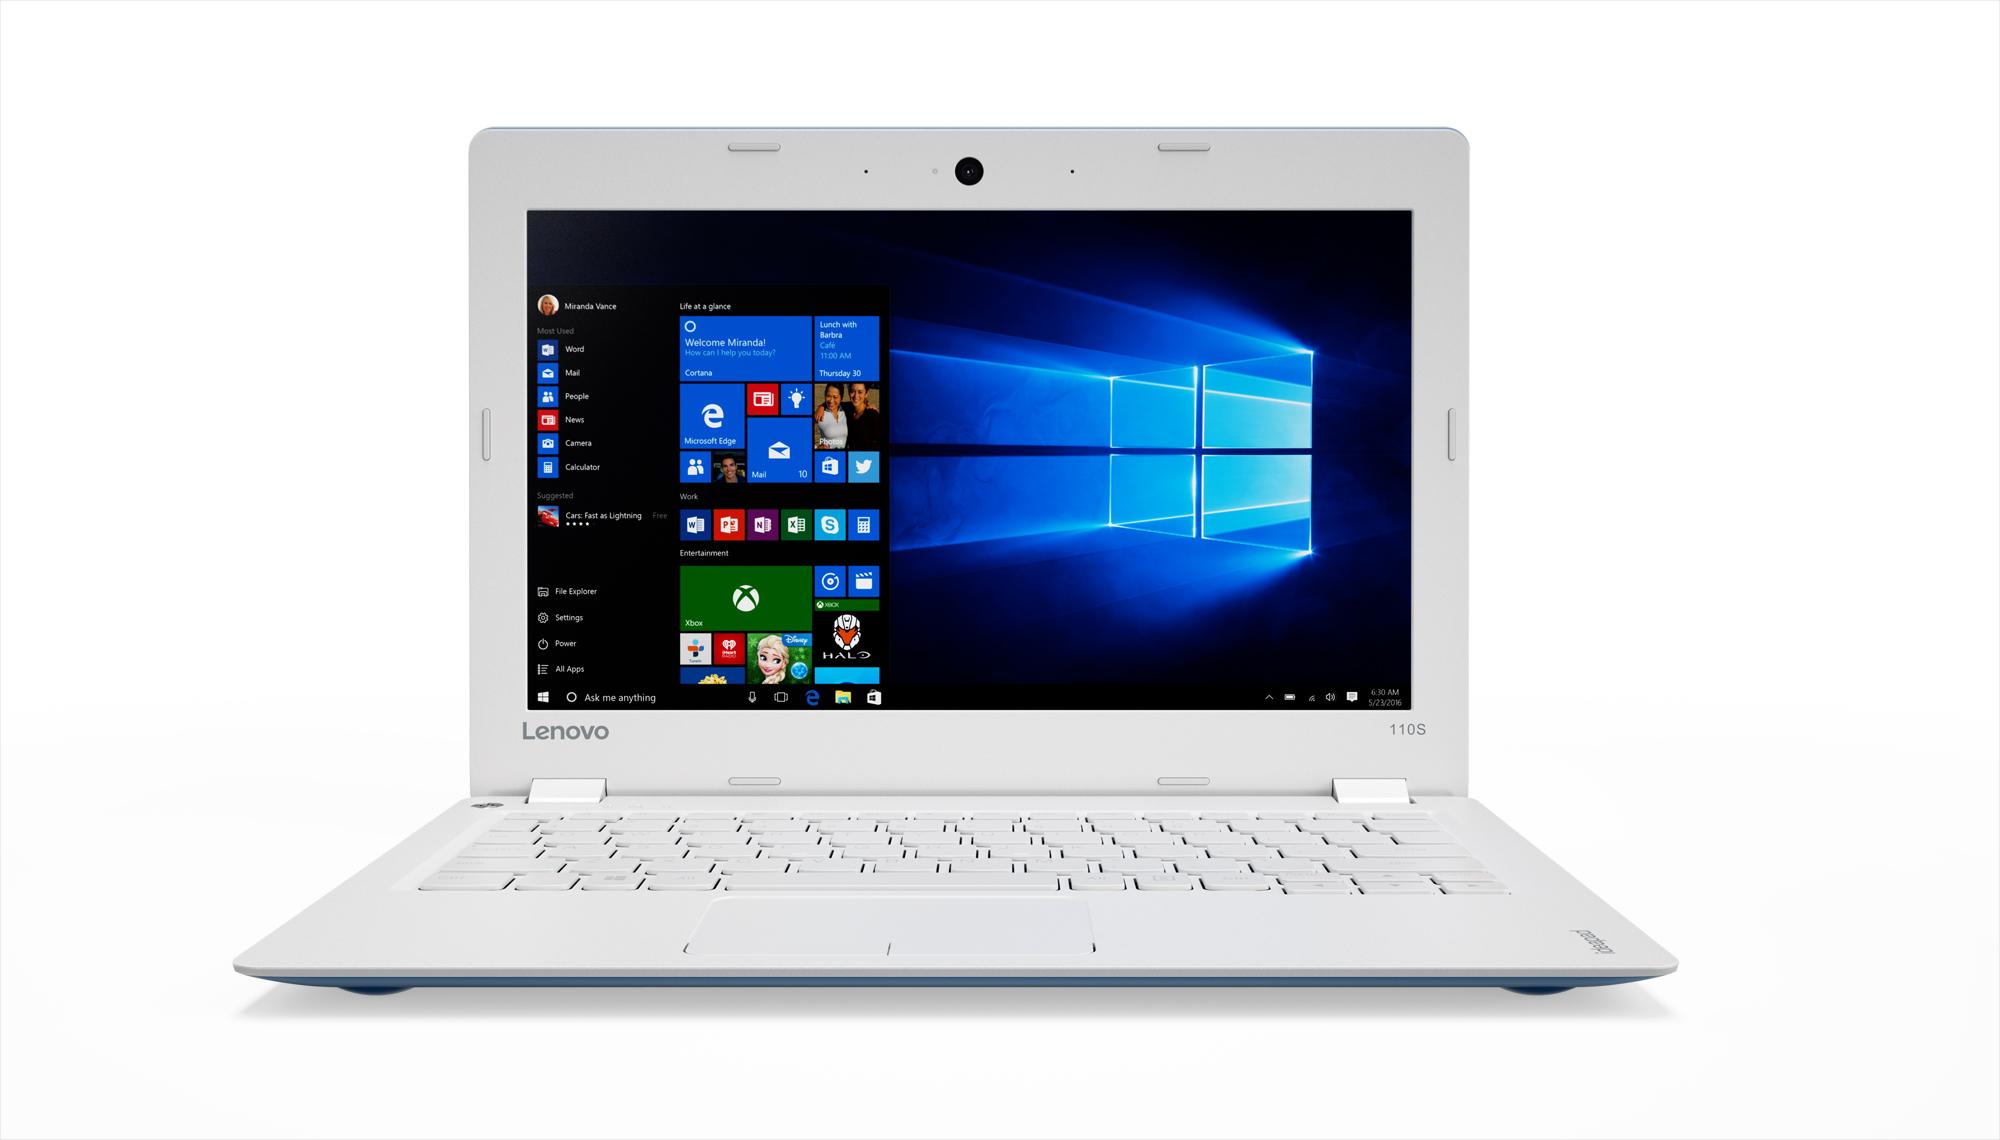 80WG008DCK Lenovo IdeaPad 110S 11.6 HD TN AG/N3060/32G EMMC/2G/INT/W10 modrý